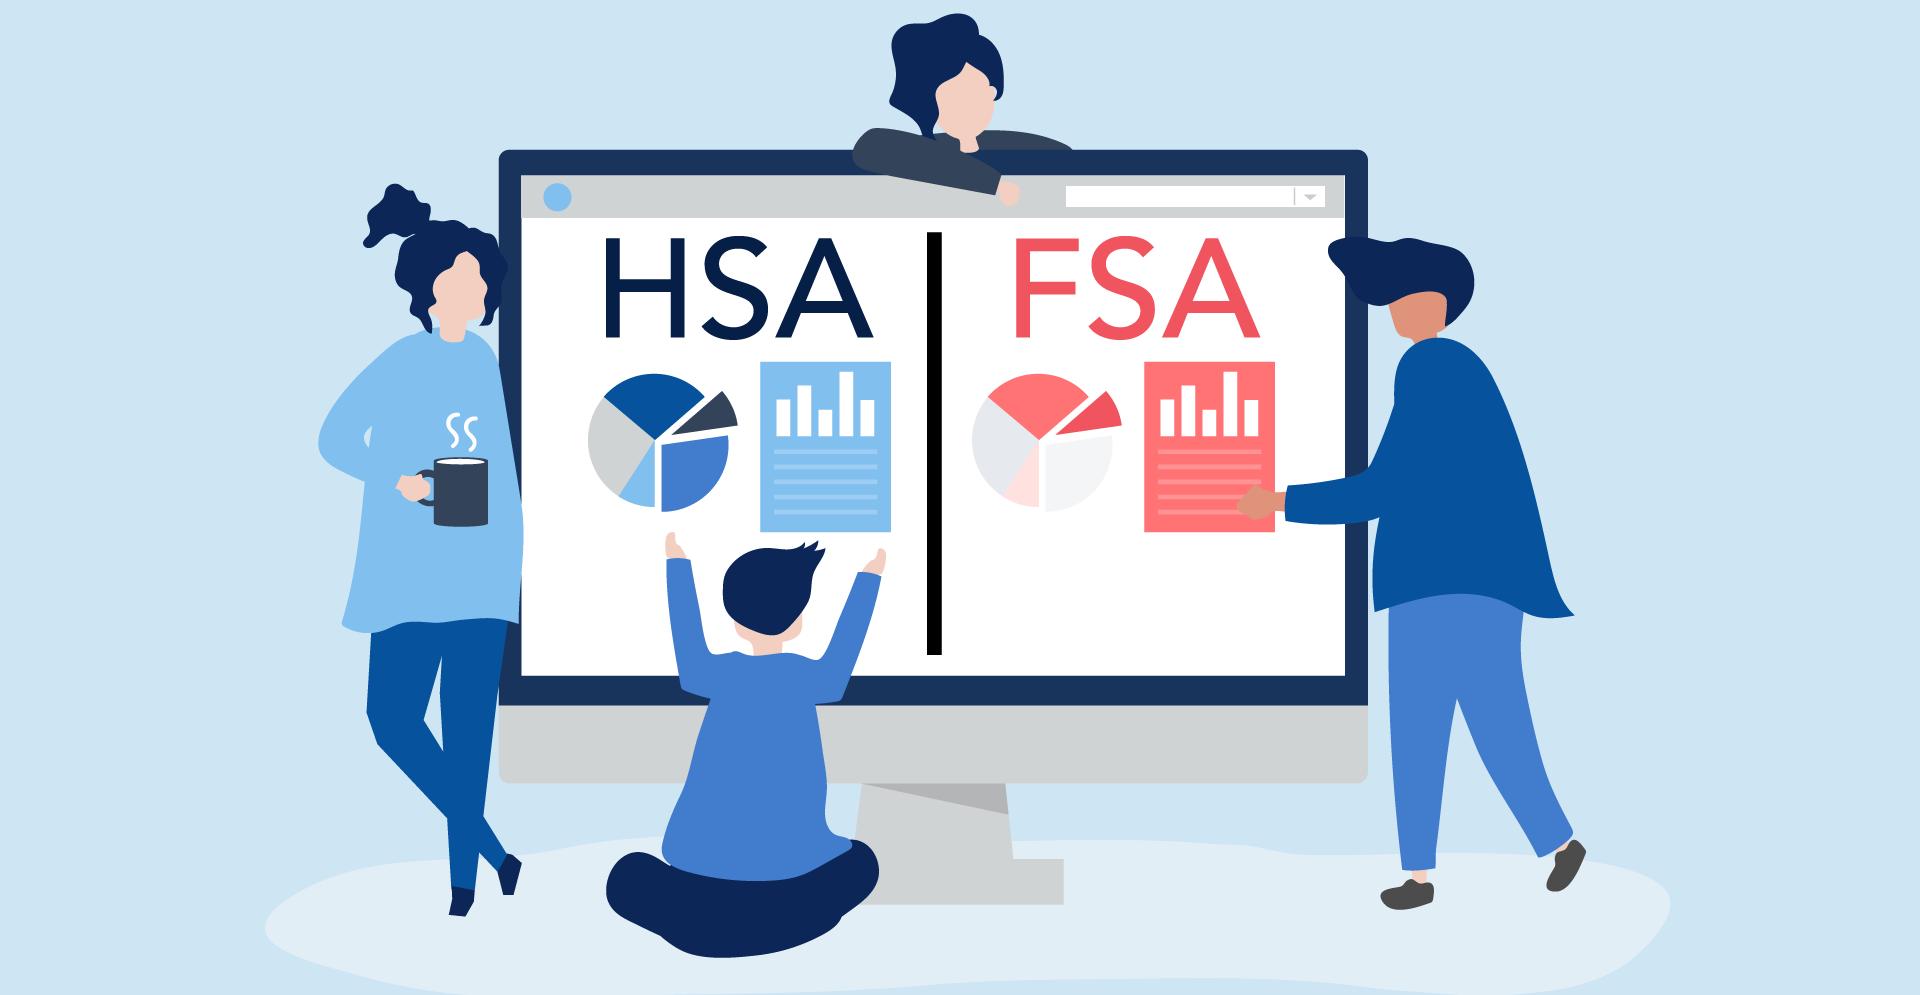 HSA vs. FSA